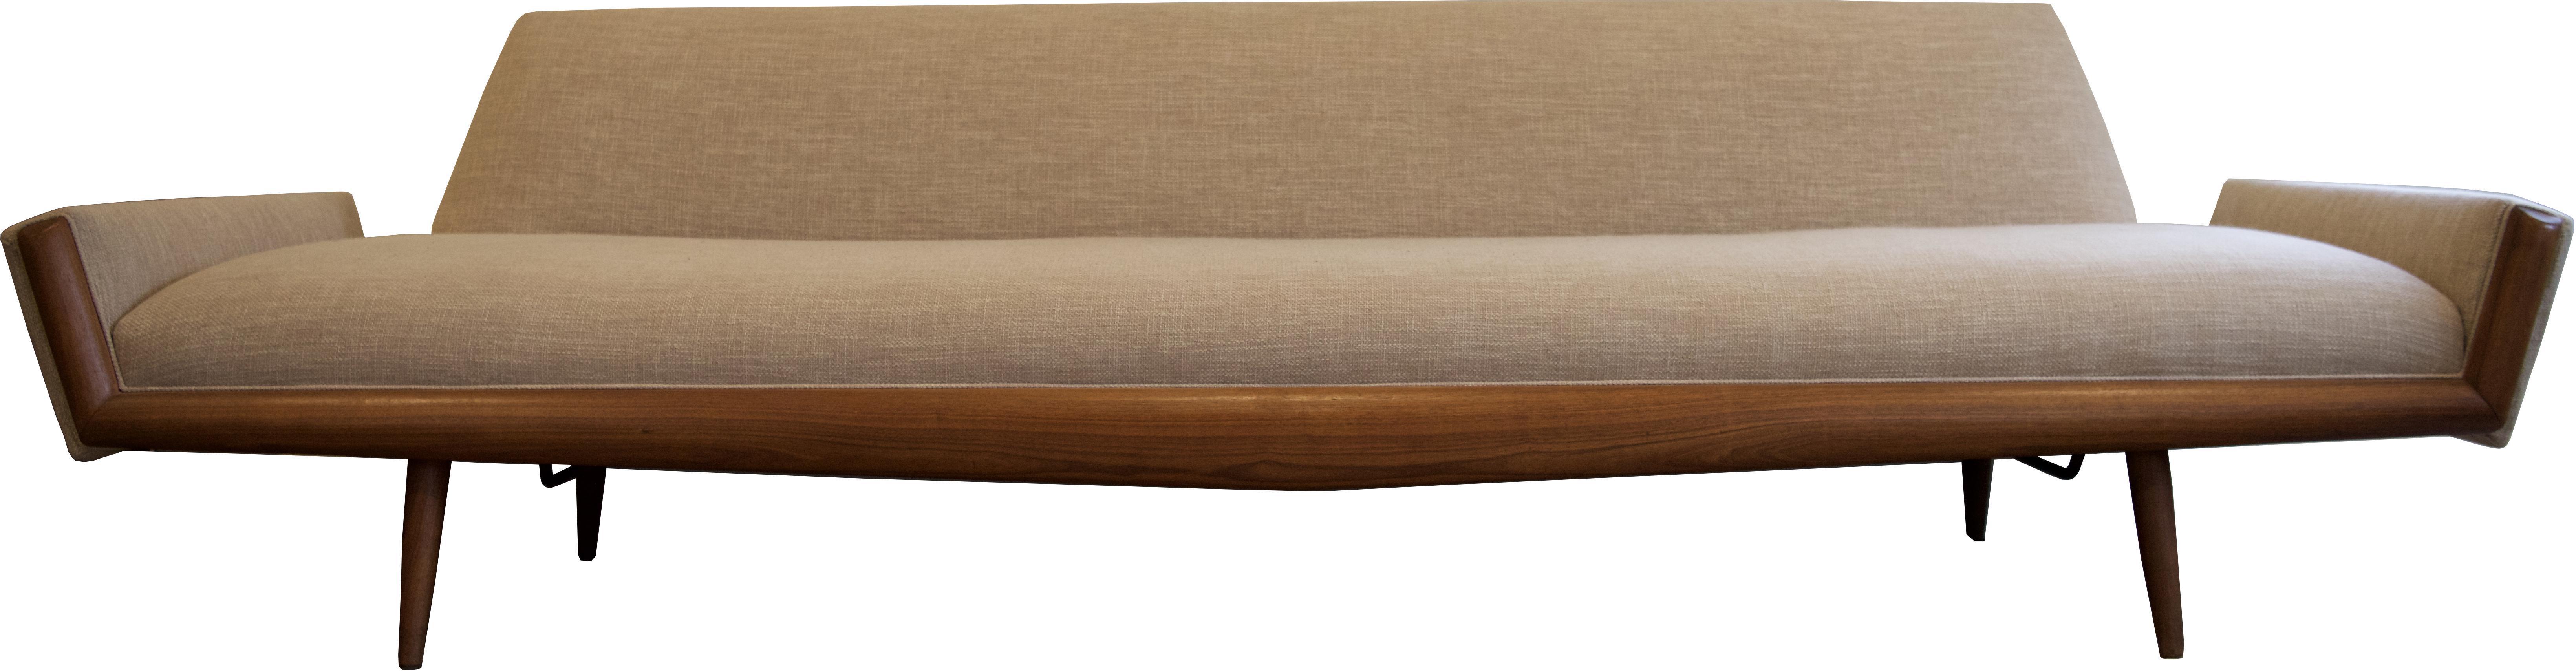 Adrian Pearsall Craft Associates Mid Century Modern MCM 2000 S Sofa |  Chairish